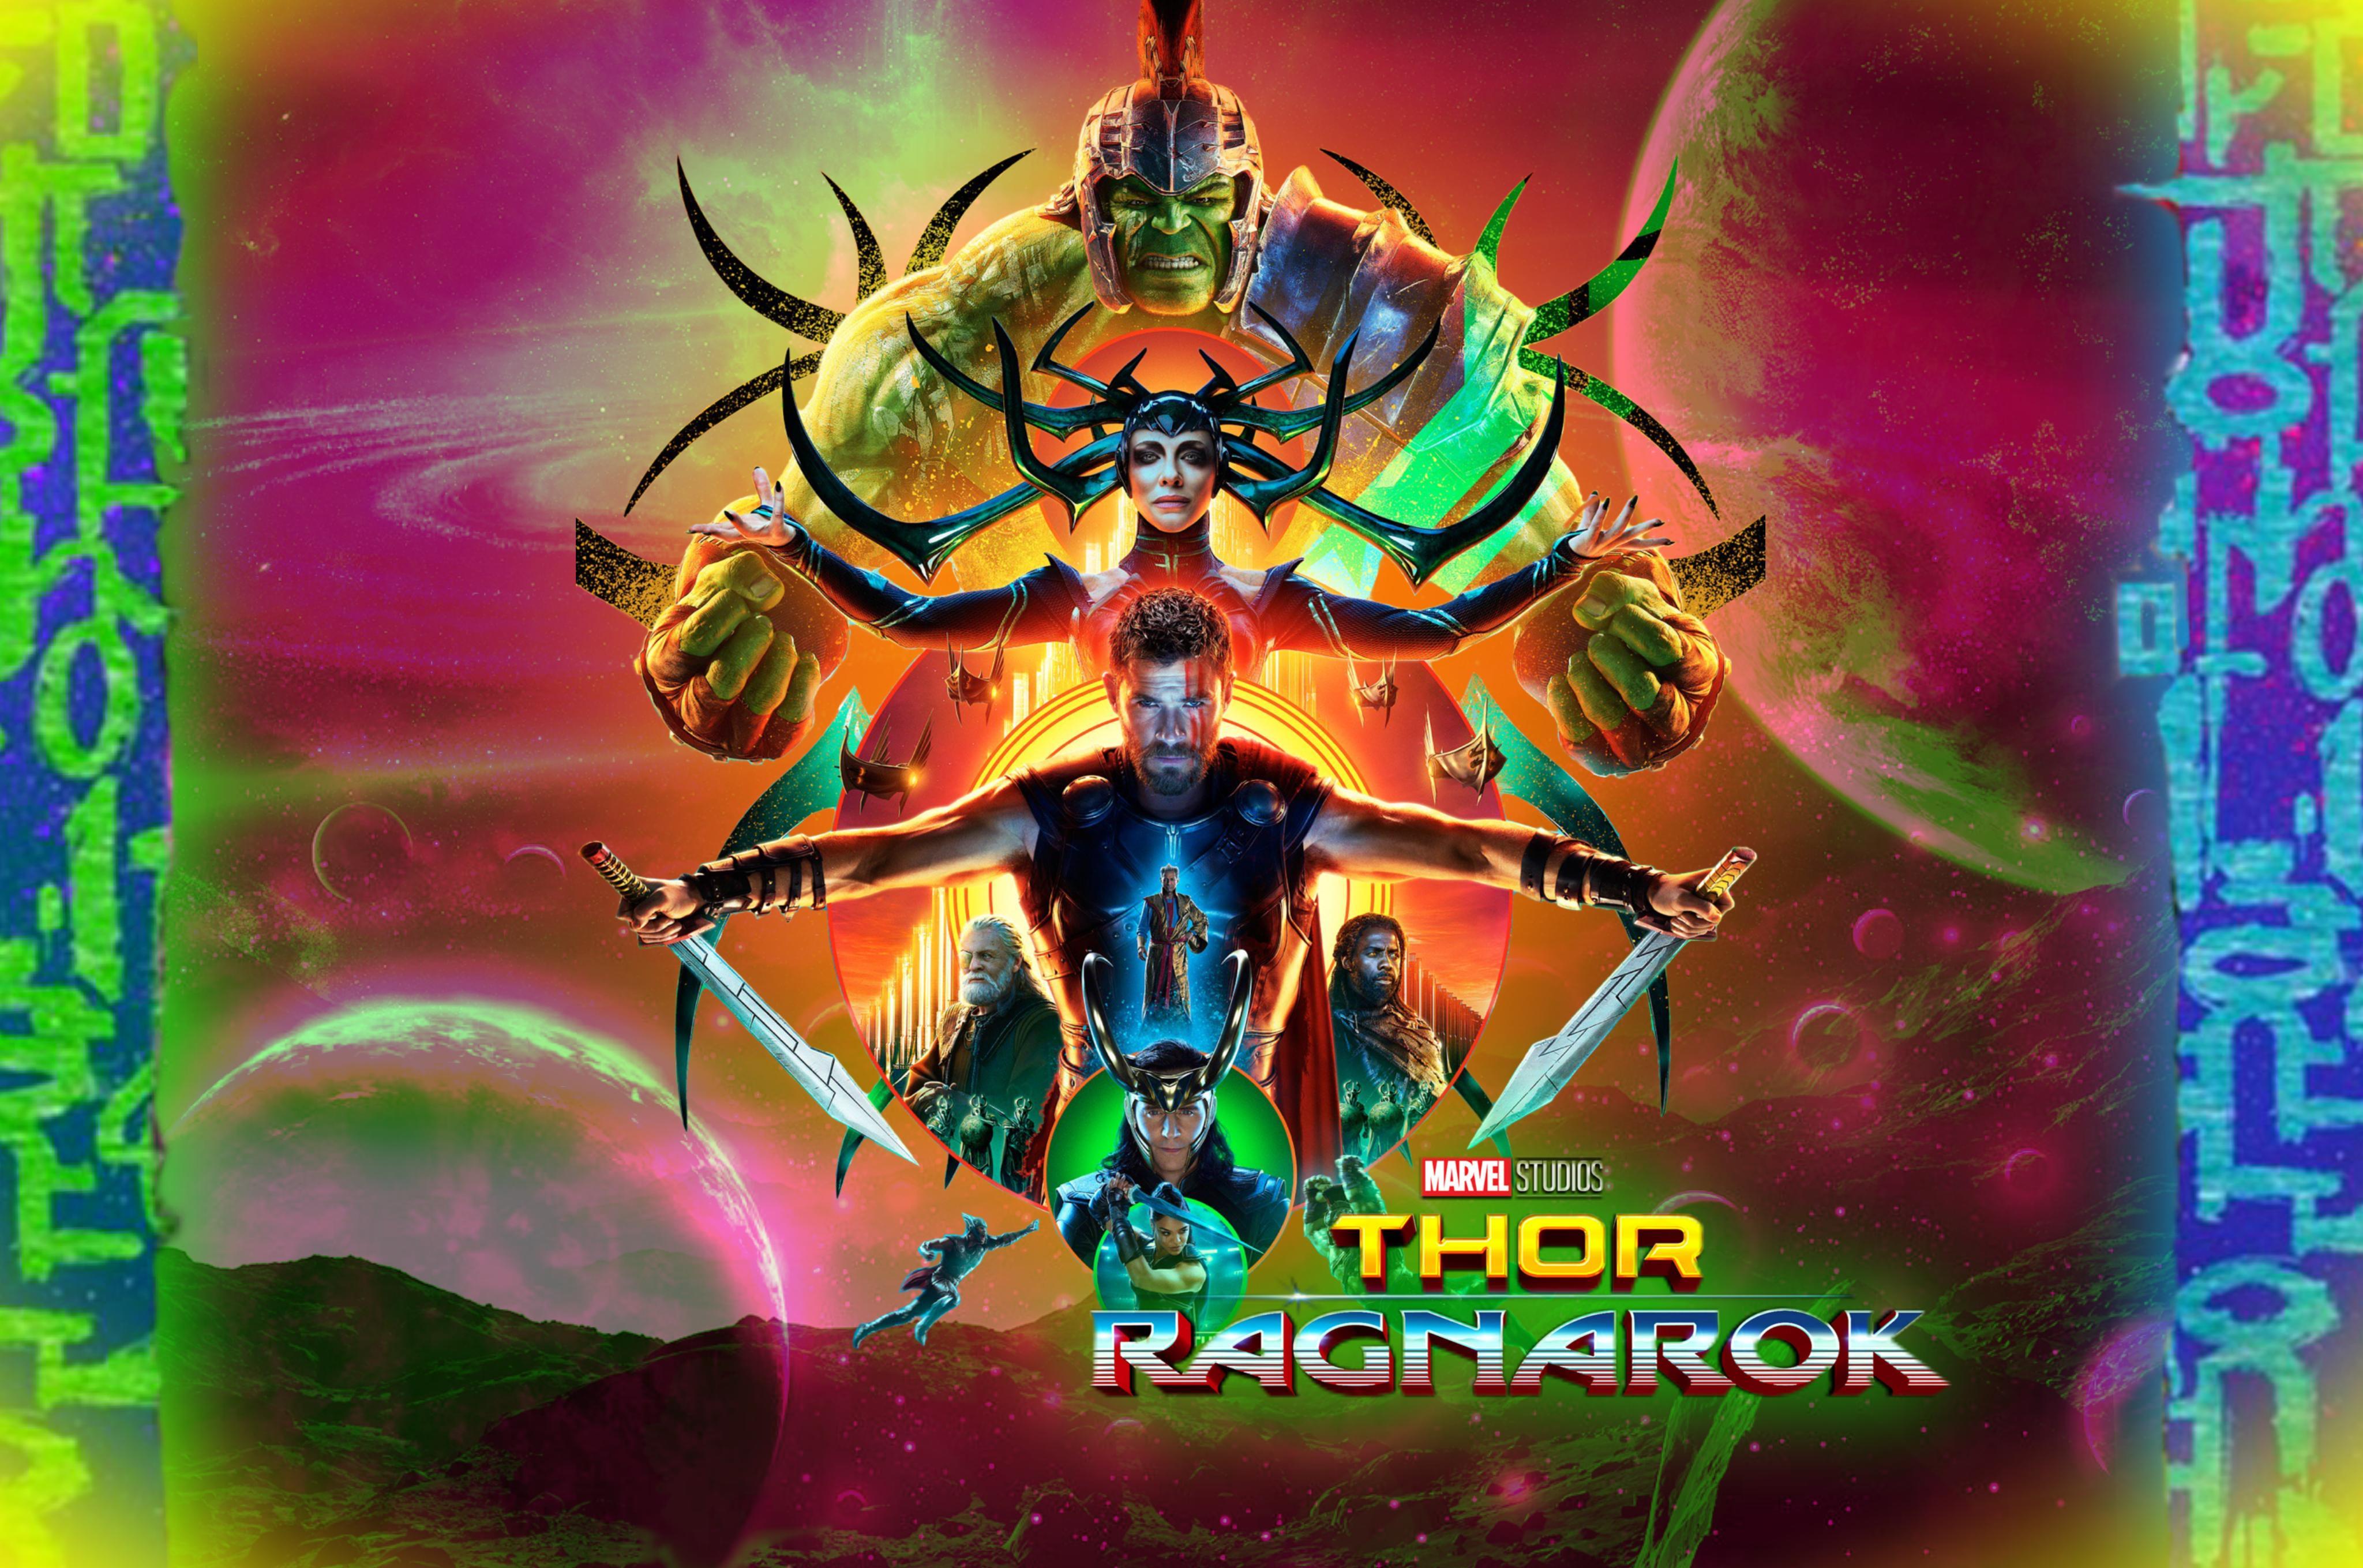 Hela Thor Ragnarok Wallpapers Wallpaper Cave